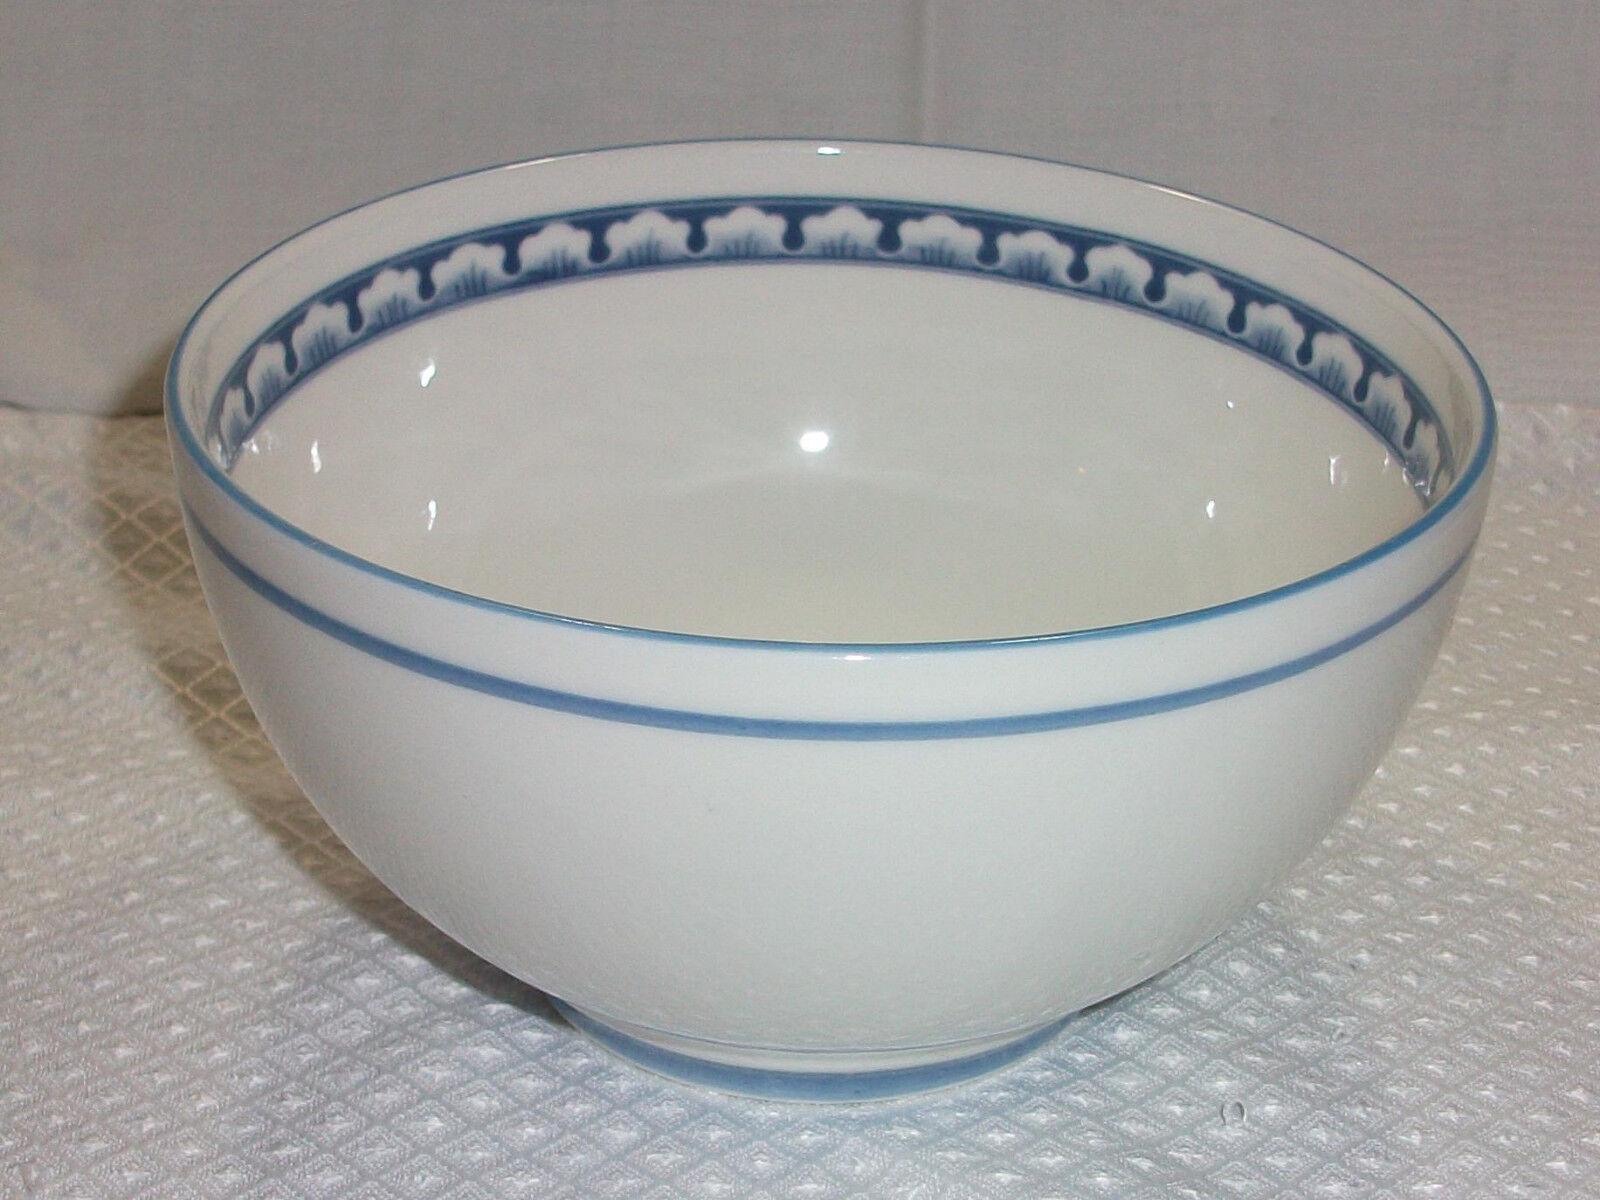 Villeroy & Boch - Casa Blau - Müsli-Schale Bowl - RAR   Stil